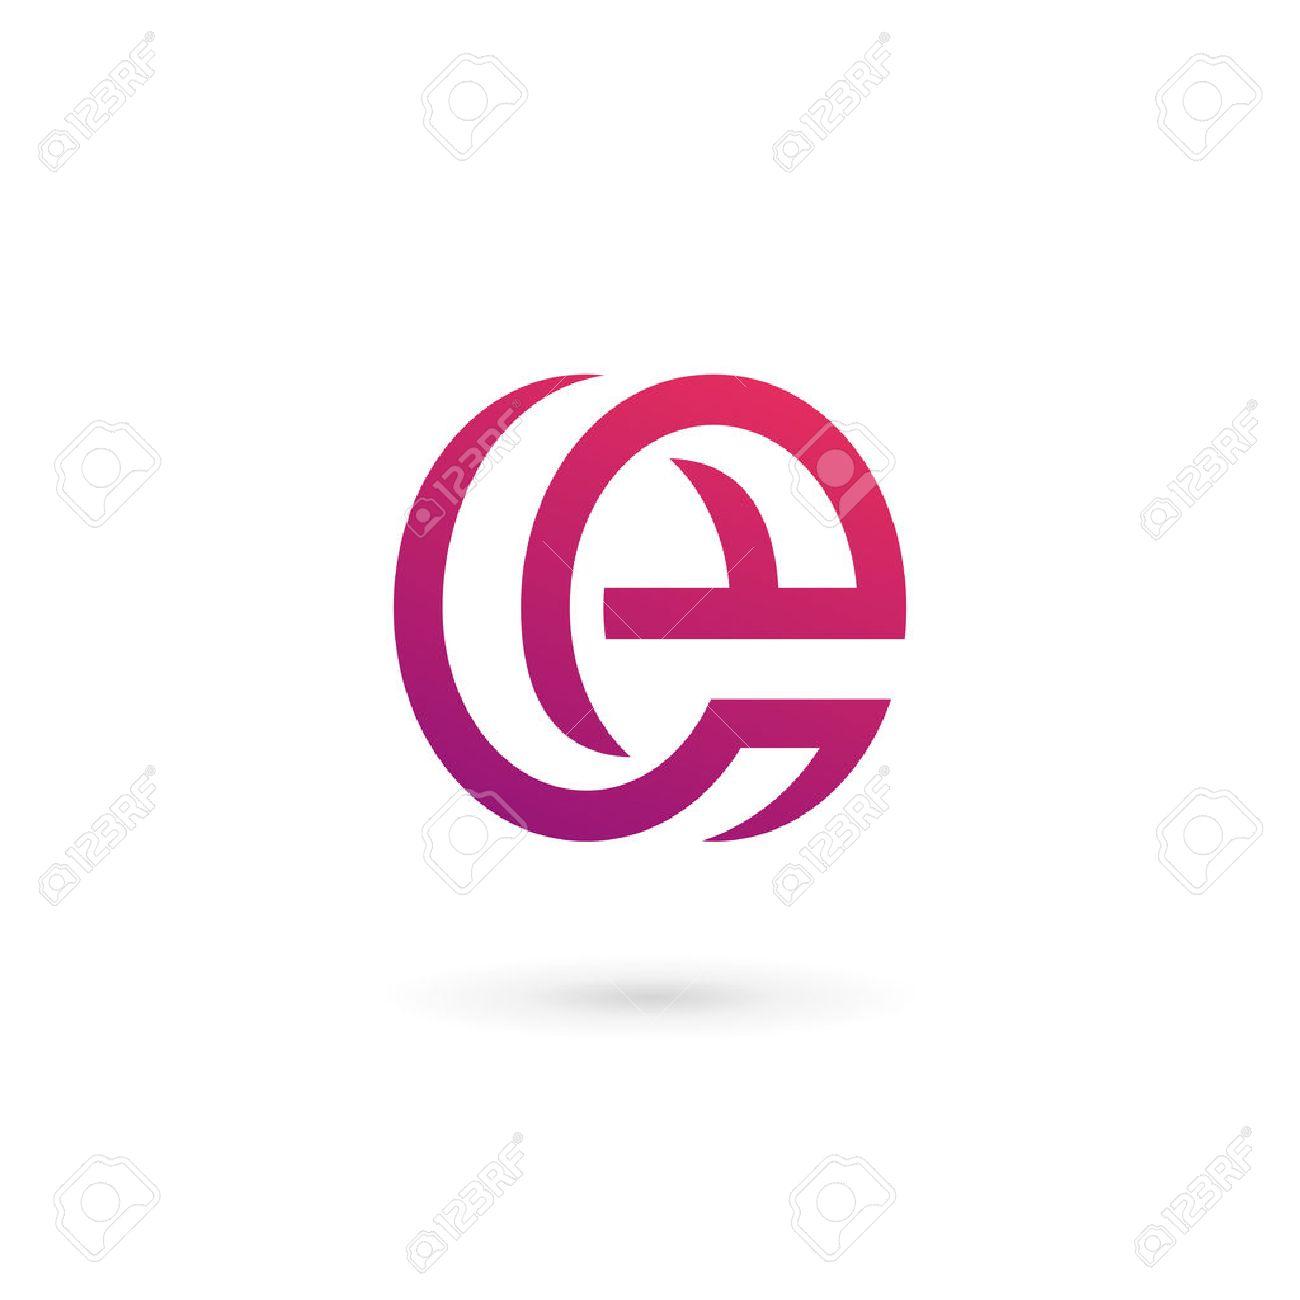 8,791 E Logo Stock Illustrations, Cliparts And Royalty Free E Logo ...